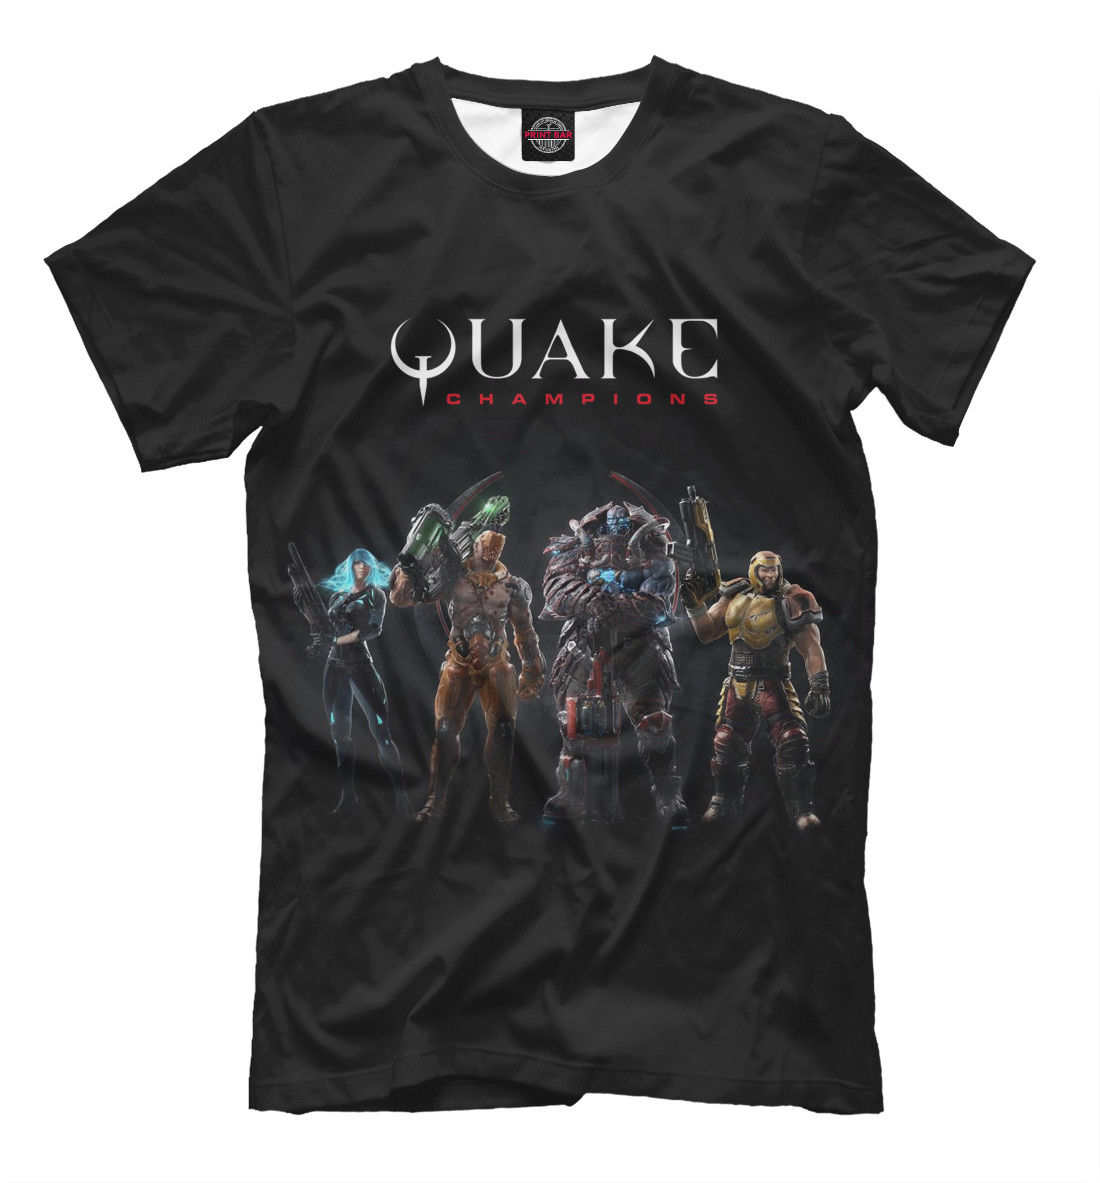 Camiseta Quake-videojuego shooter old school camiseta para jugador Cool Casual pride camiseta hombres Unisex camiseta de moda envío gratis